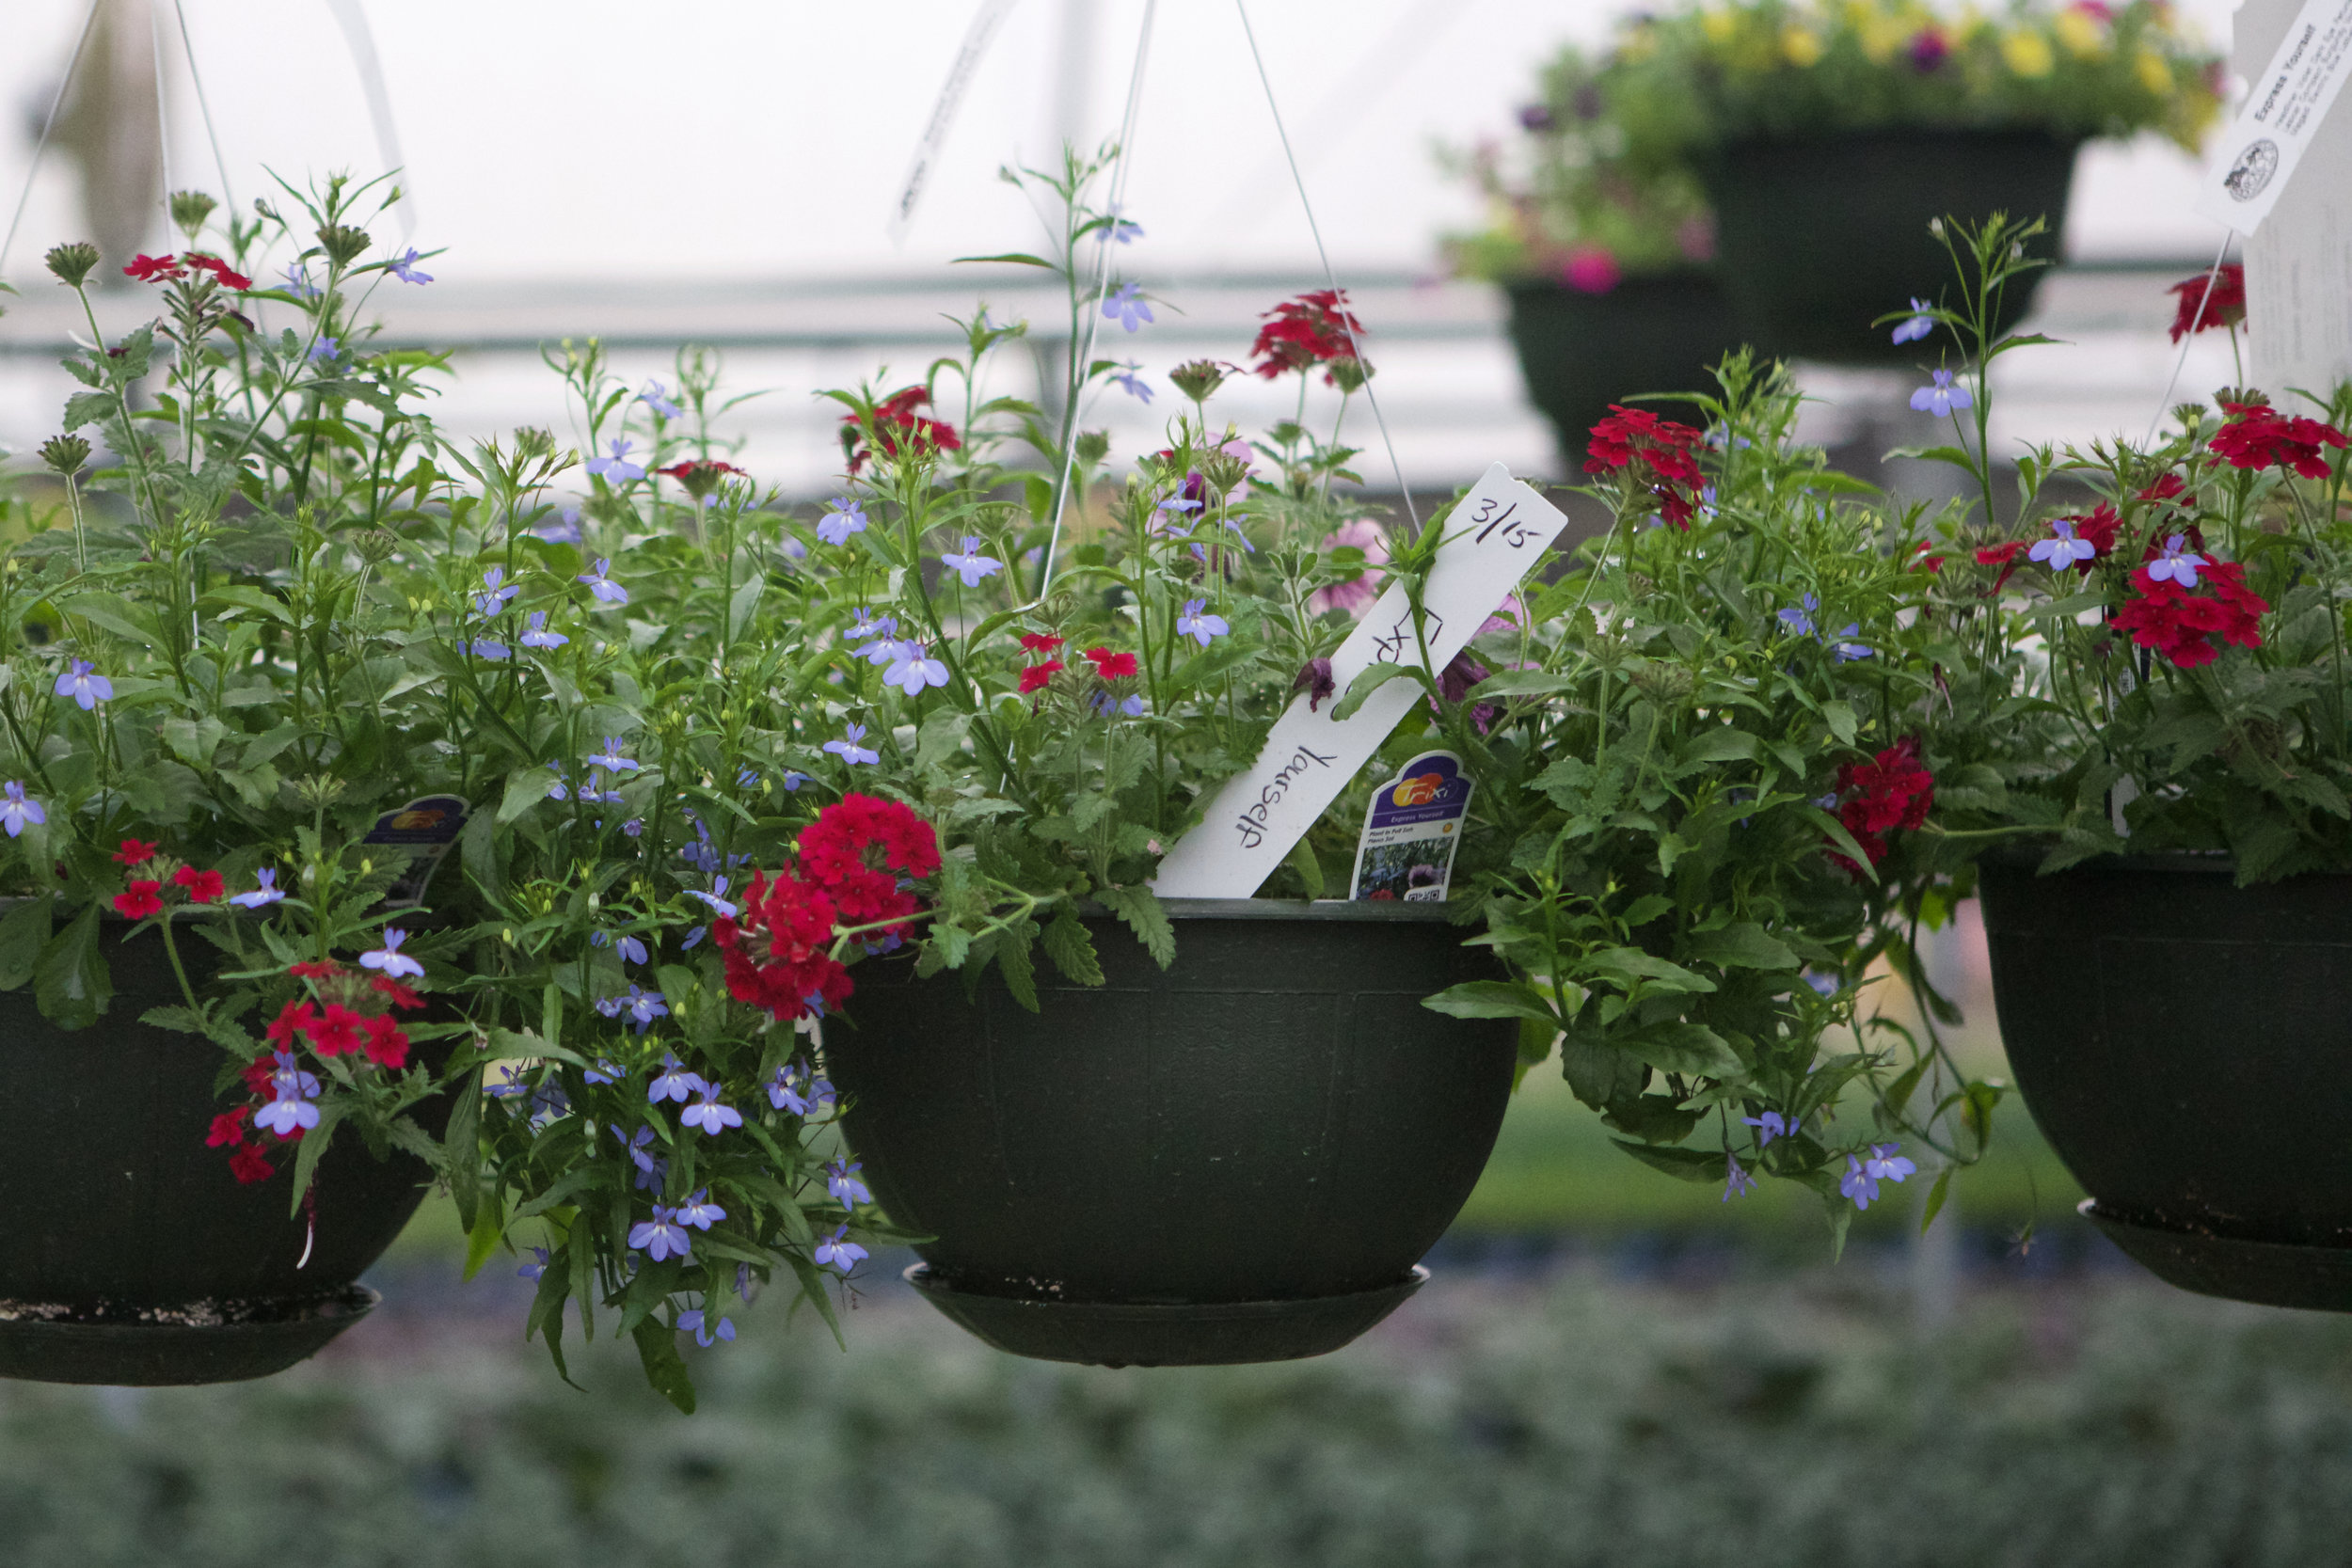 SquarespaceImage19-nursery-pottedplant.jpg